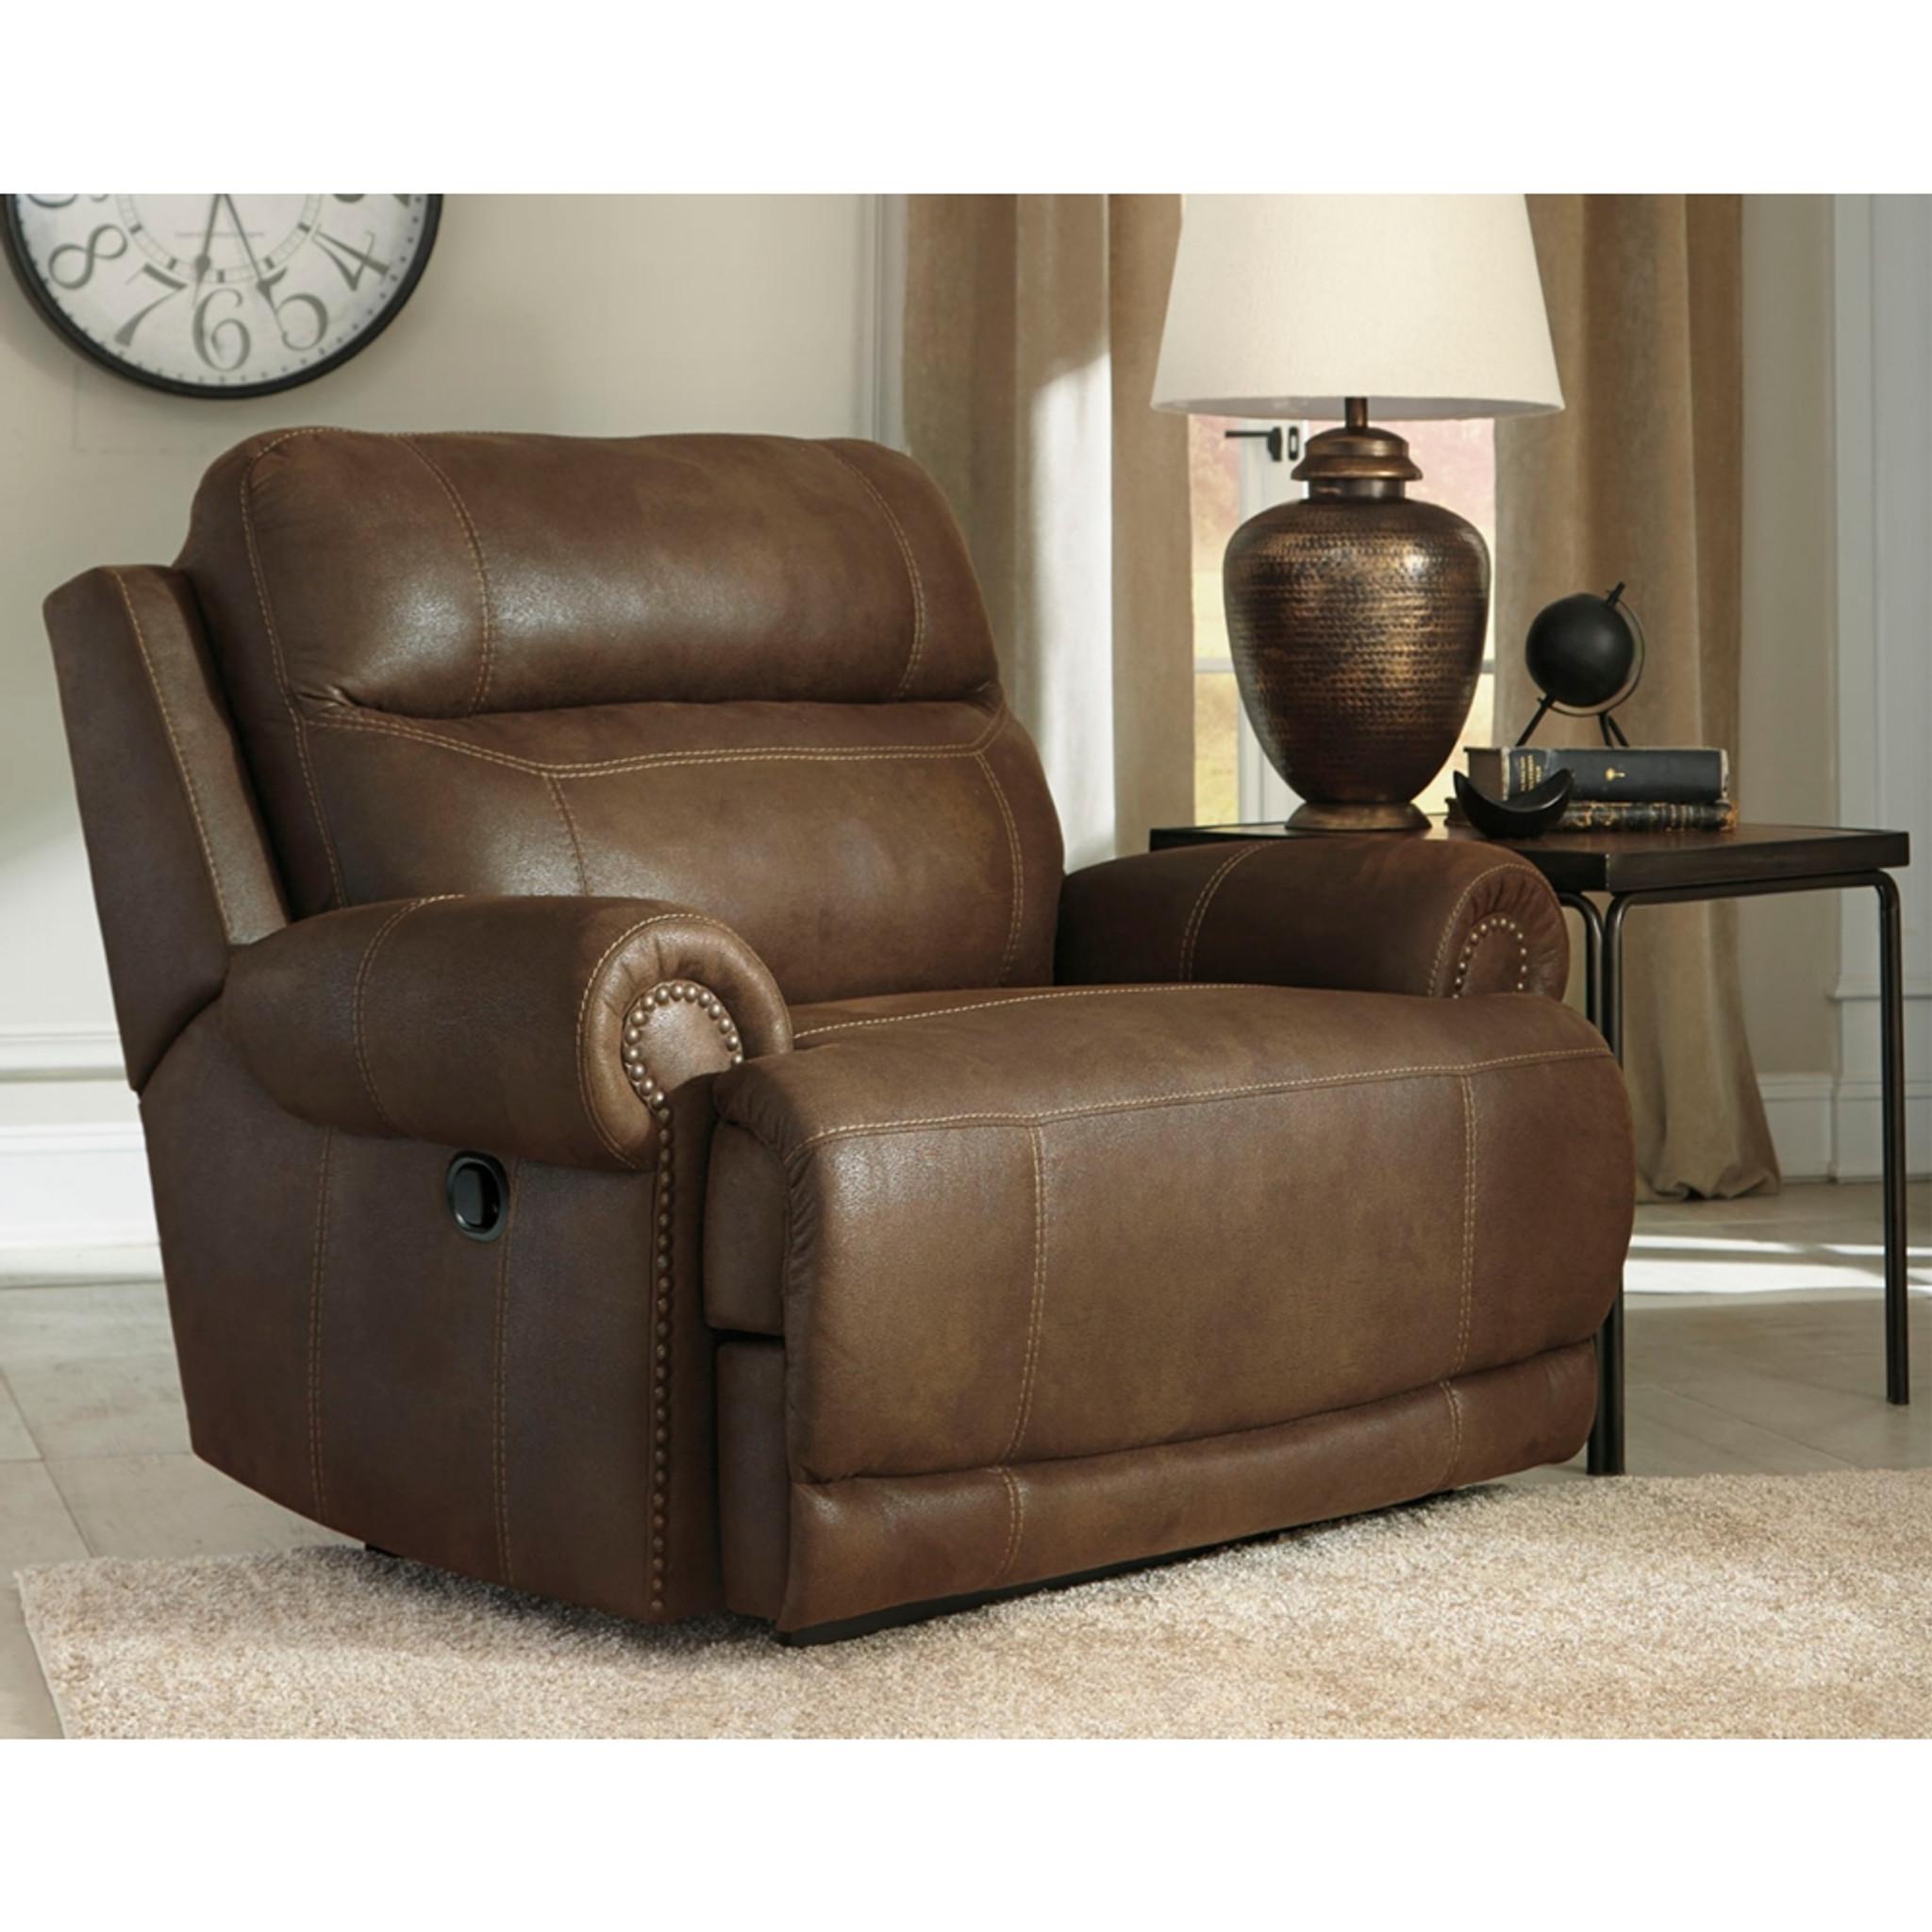 Prime Austere Brown Wide Seat Recliner Spiritservingveterans Wood Chair Design Ideas Spiritservingveteransorg